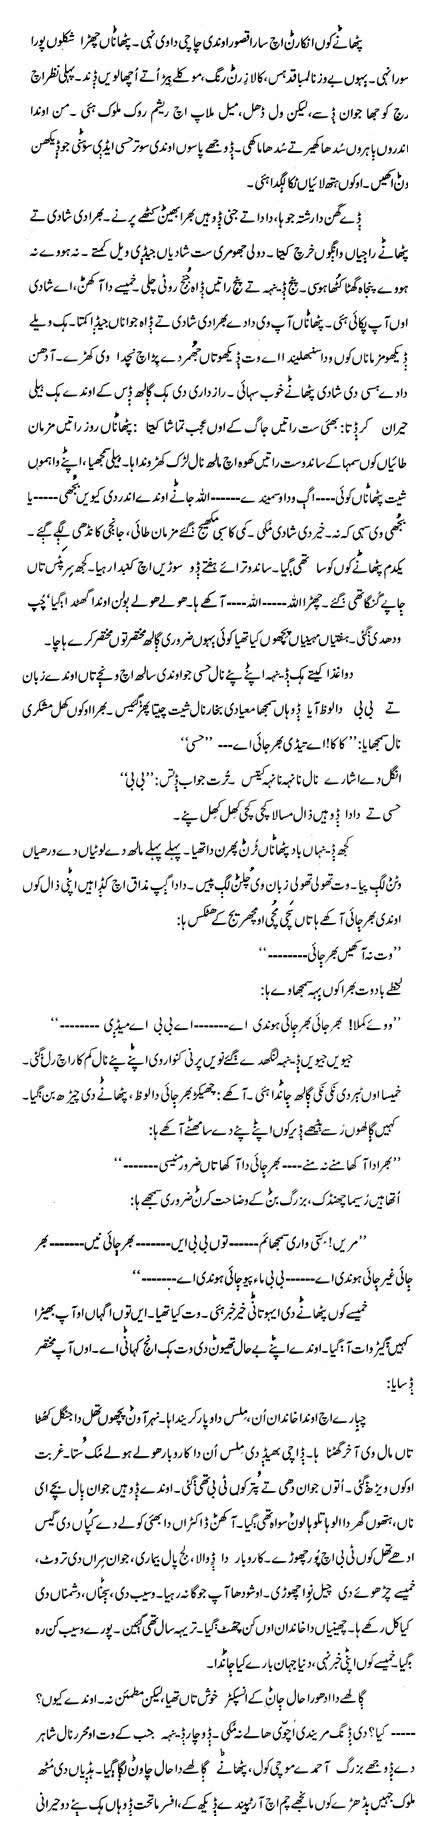 Seraiki Afsana Allah...Dada...Bibi (Mazar Khan) Part-3